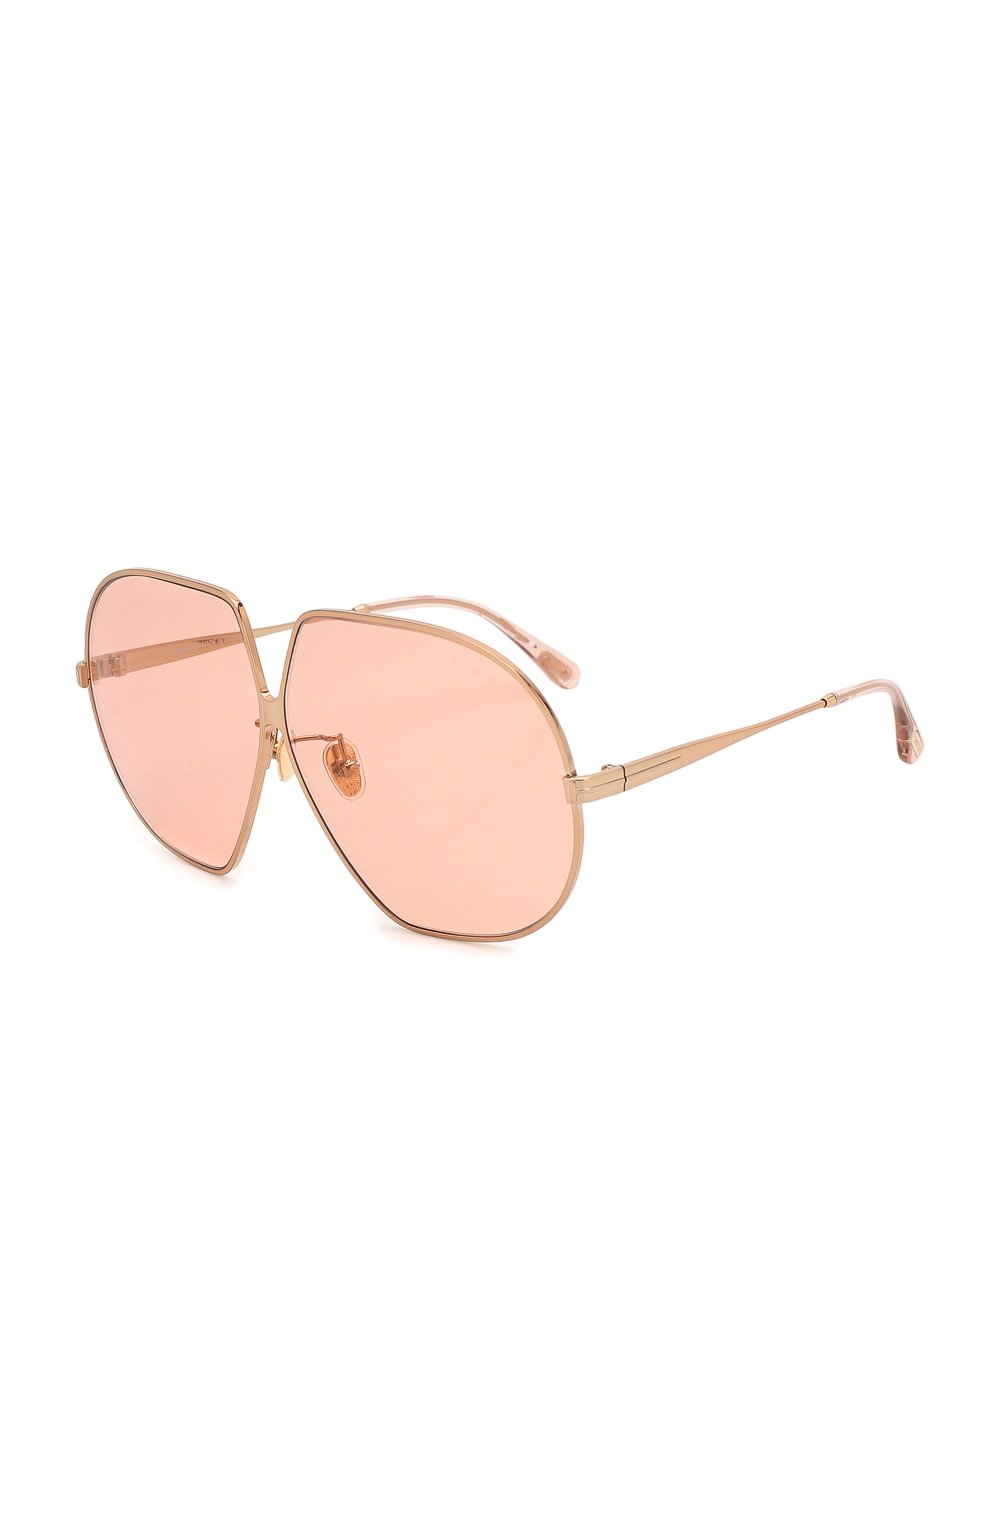 Женские солнцезащитные очки TOM FORD розового цвета, арт. TF785 33E   Фото 1